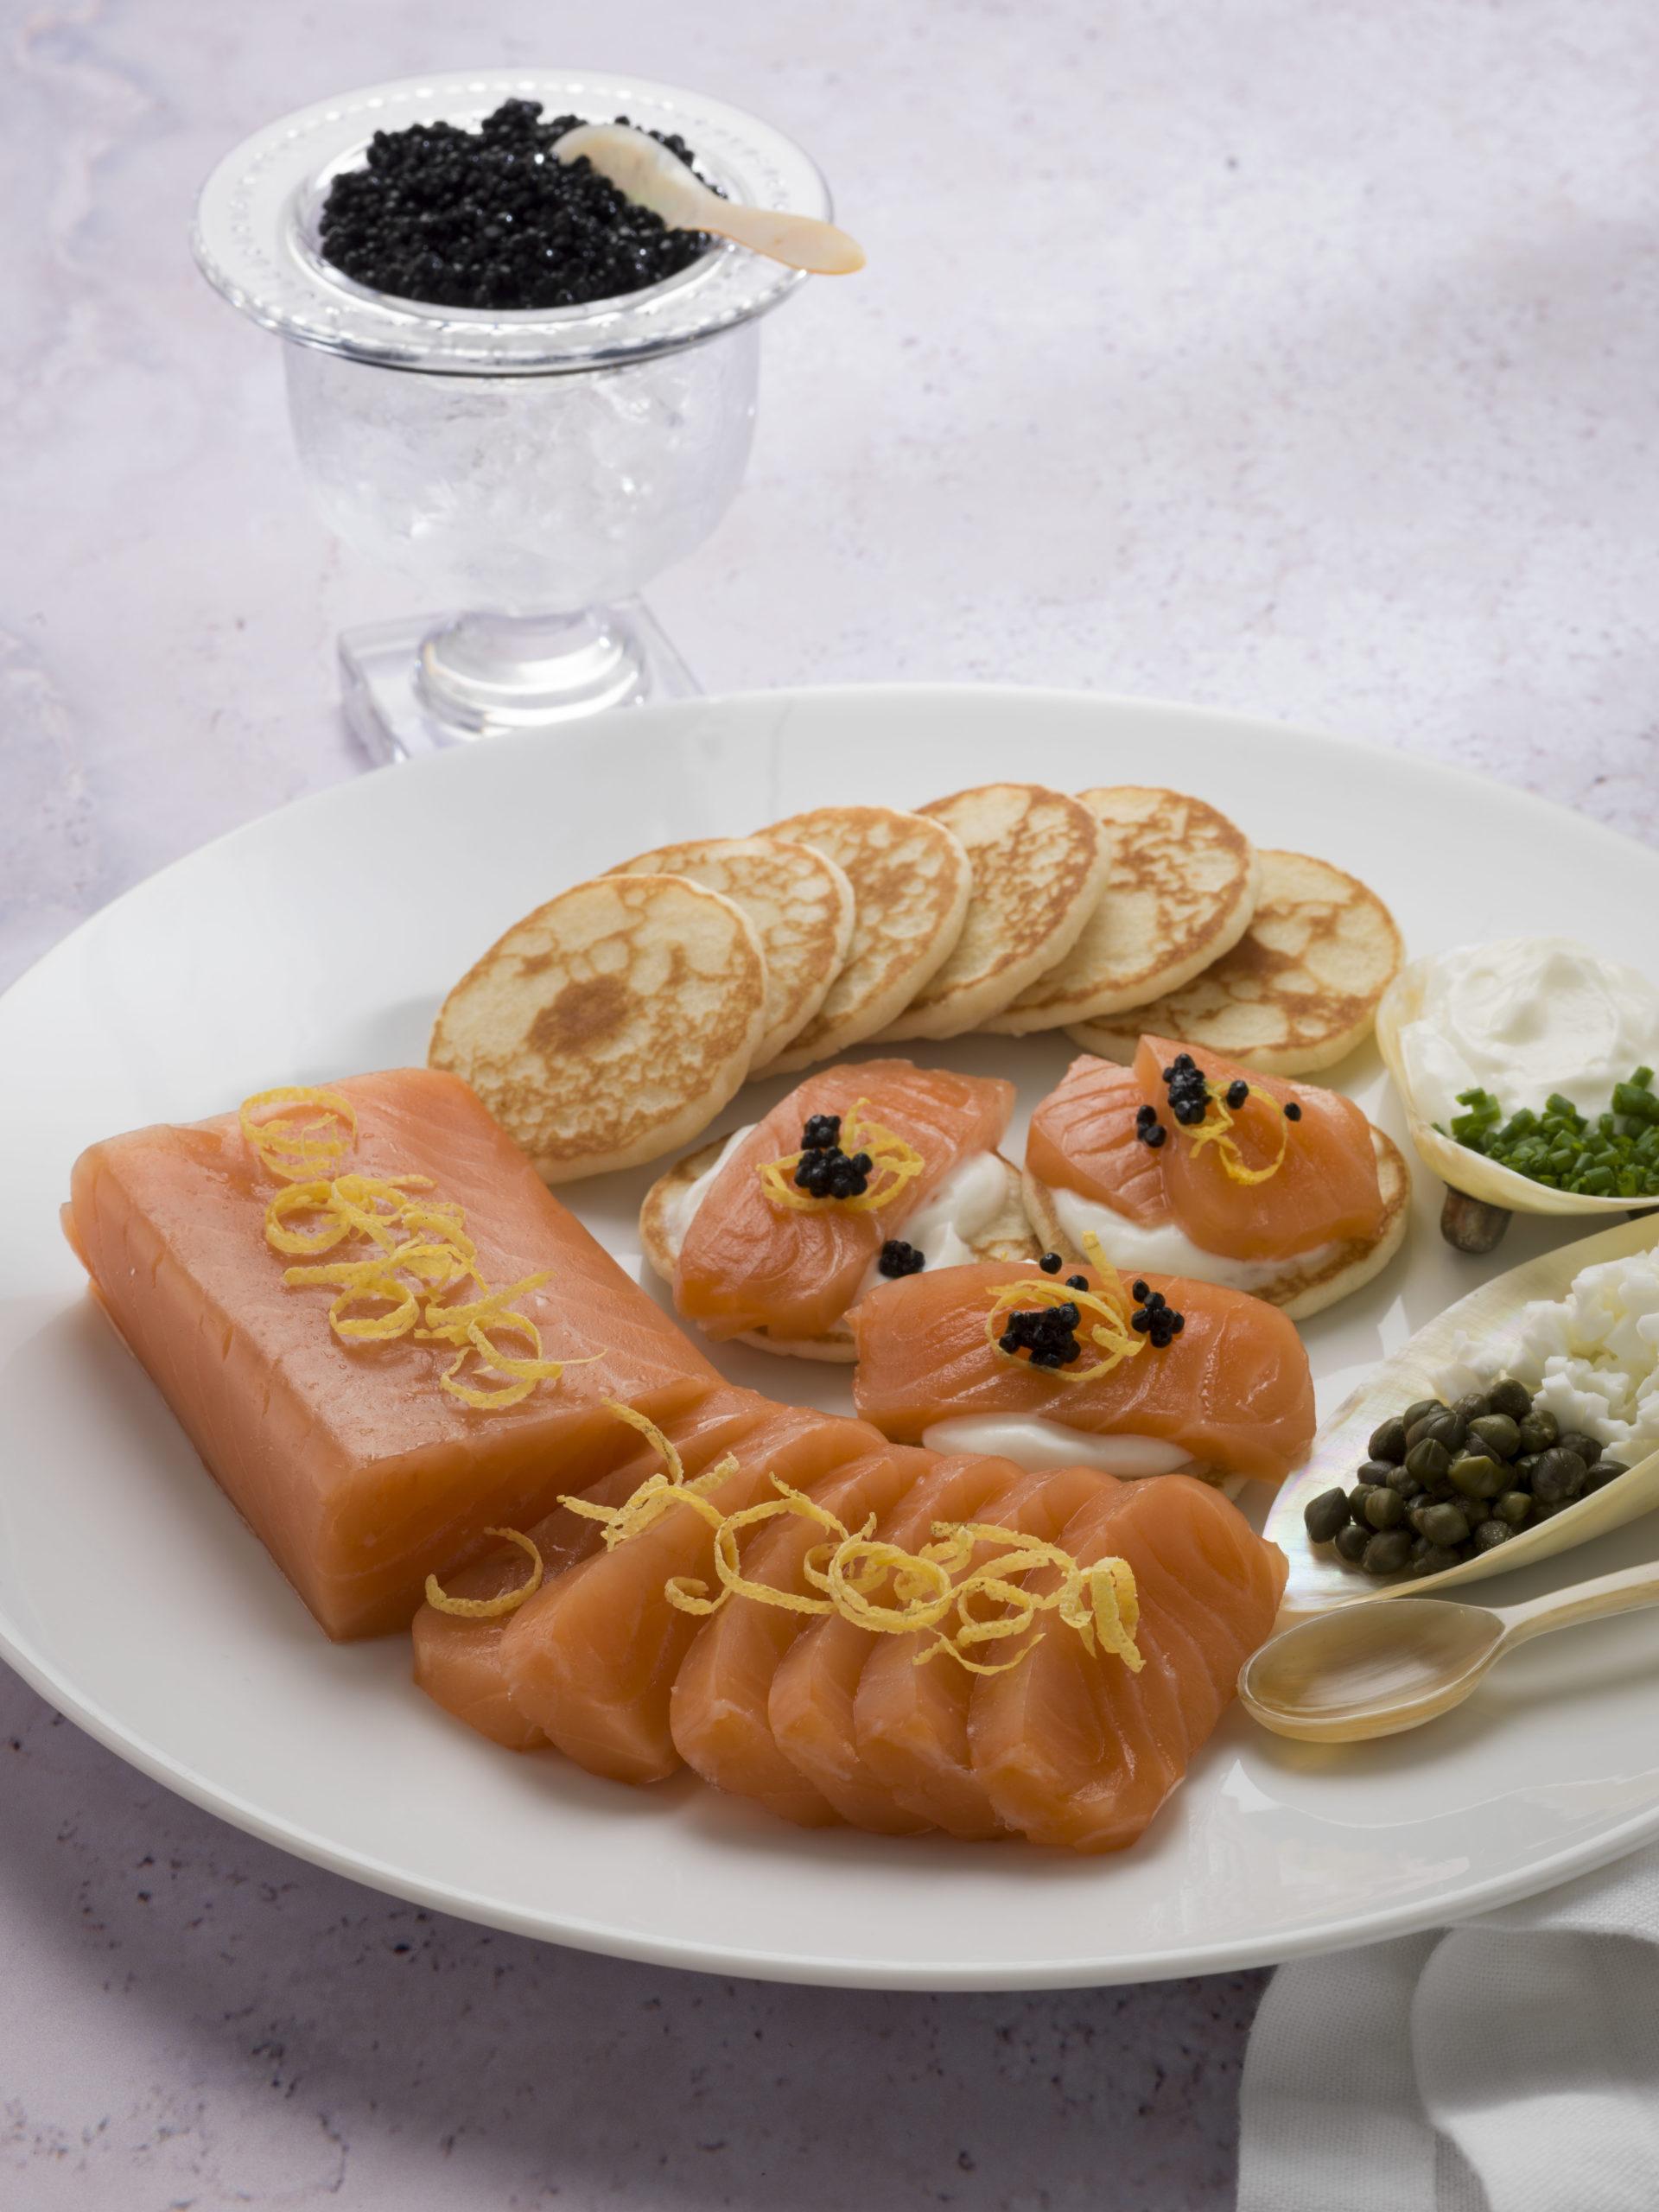 photo of balik salmon prepared as a meal